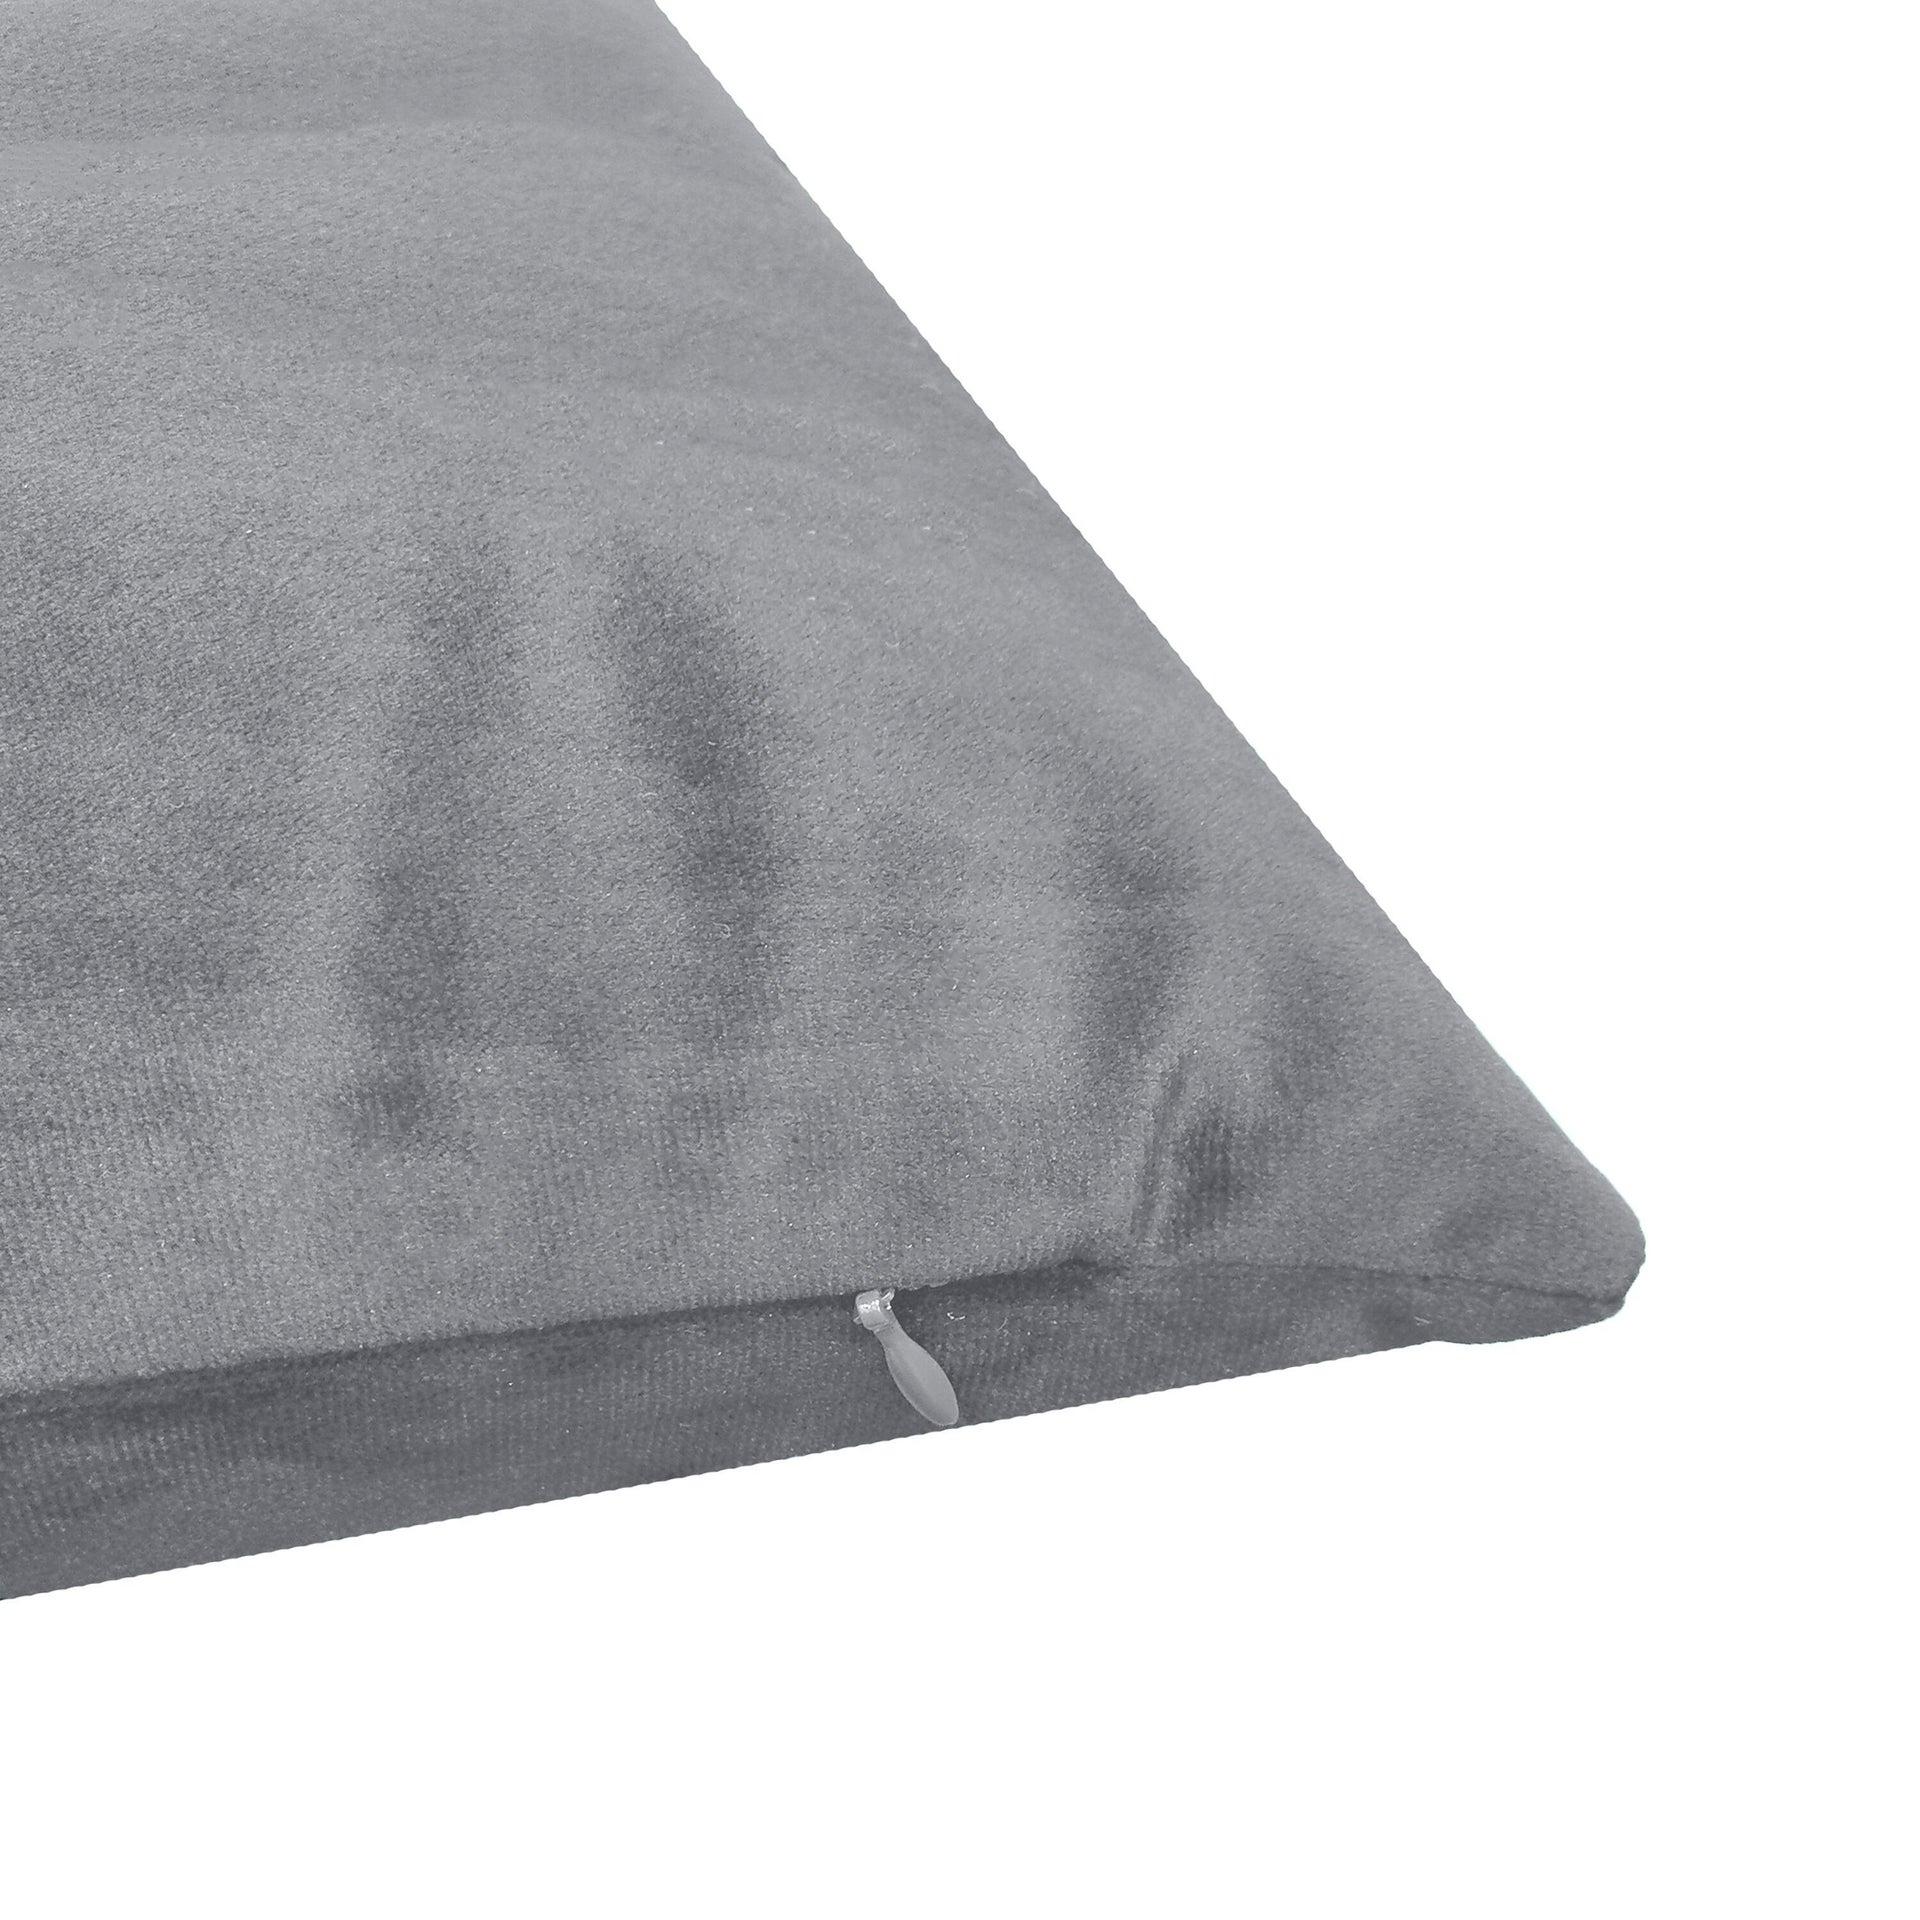 Cuscino INSPIRE Tony grigio 45x45 cm - 5